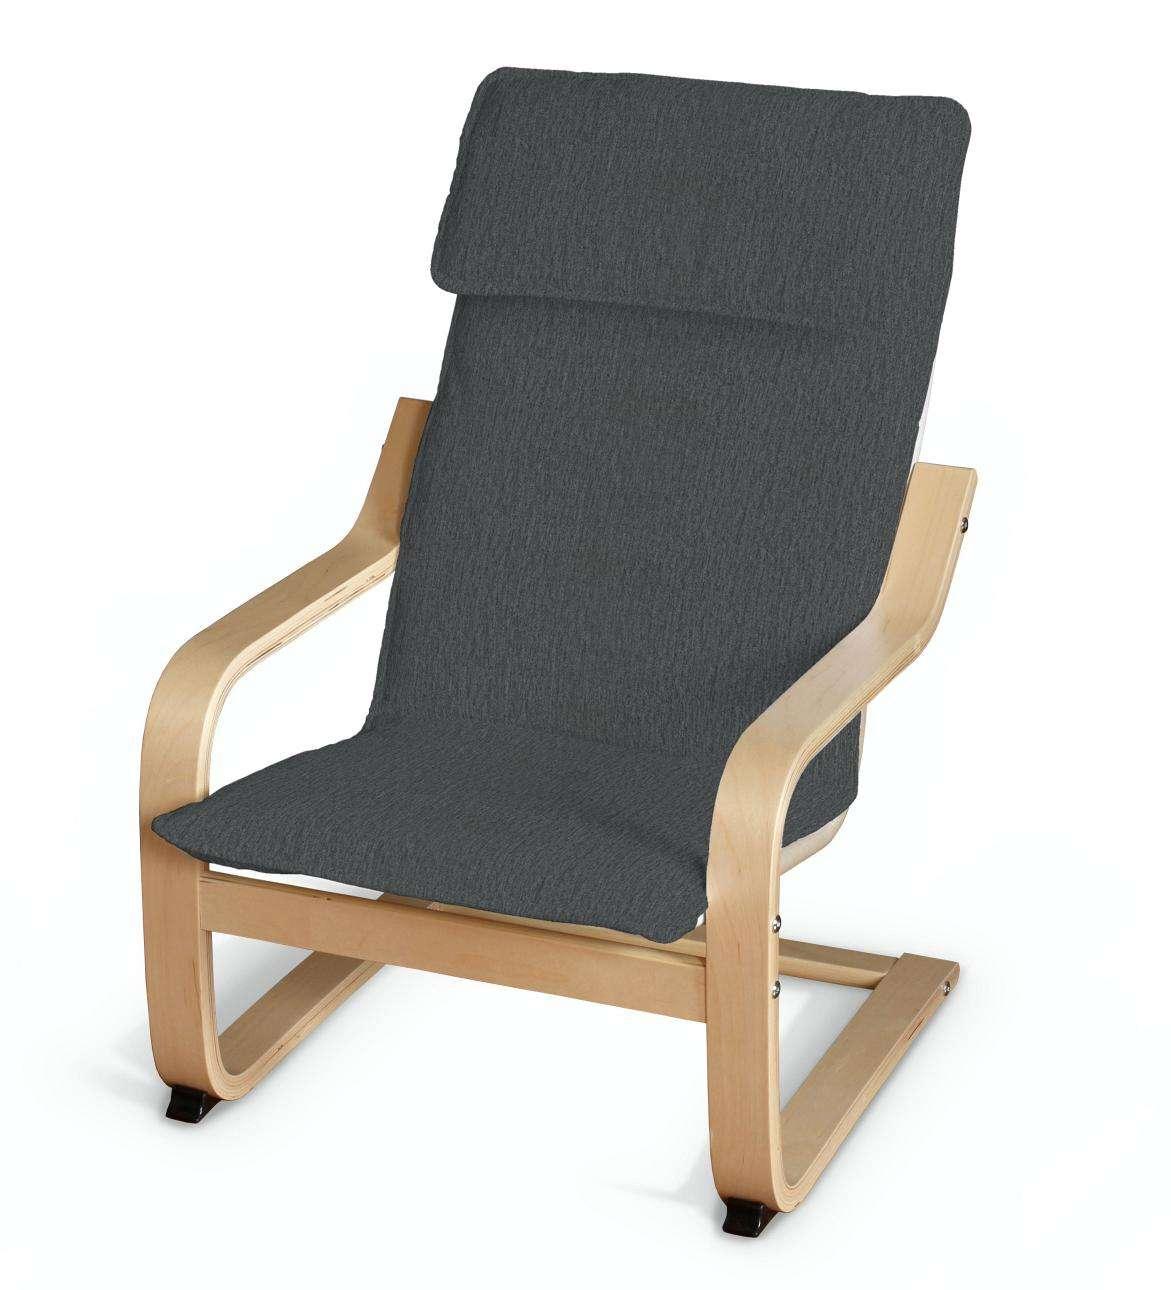 po ng kissen f r den kindersessel stahlgrau dekoria. Black Bedroom Furniture Sets. Home Design Ideas